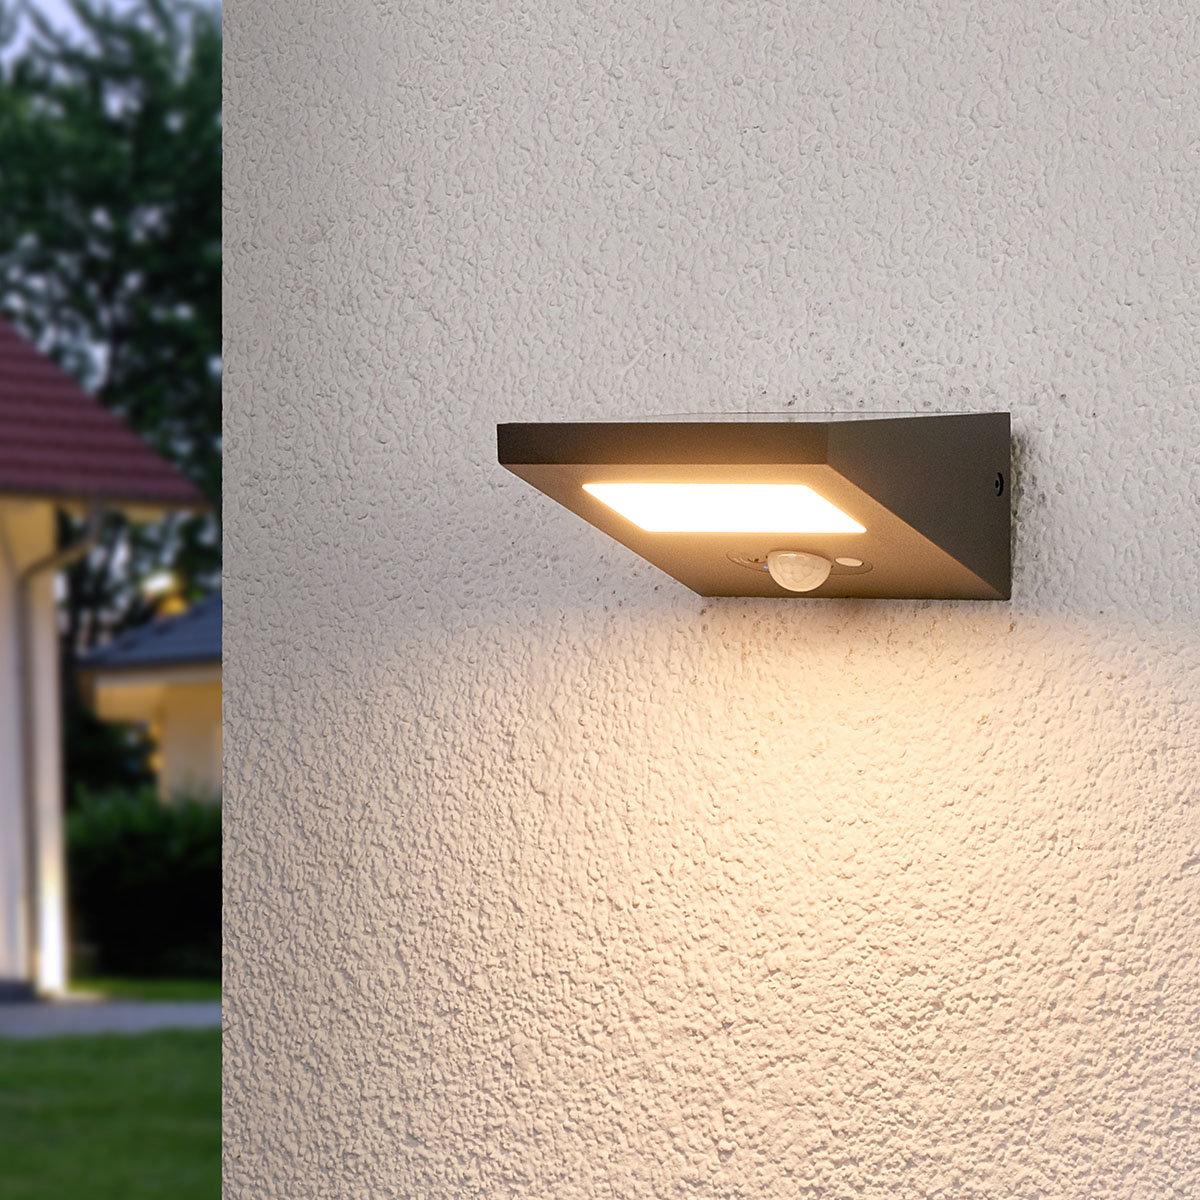 Solar-LED-Außenwandleuchte Felin mit Bewegungsmelder, 6,6x12,5x14,5 cm, Aluminium, grau